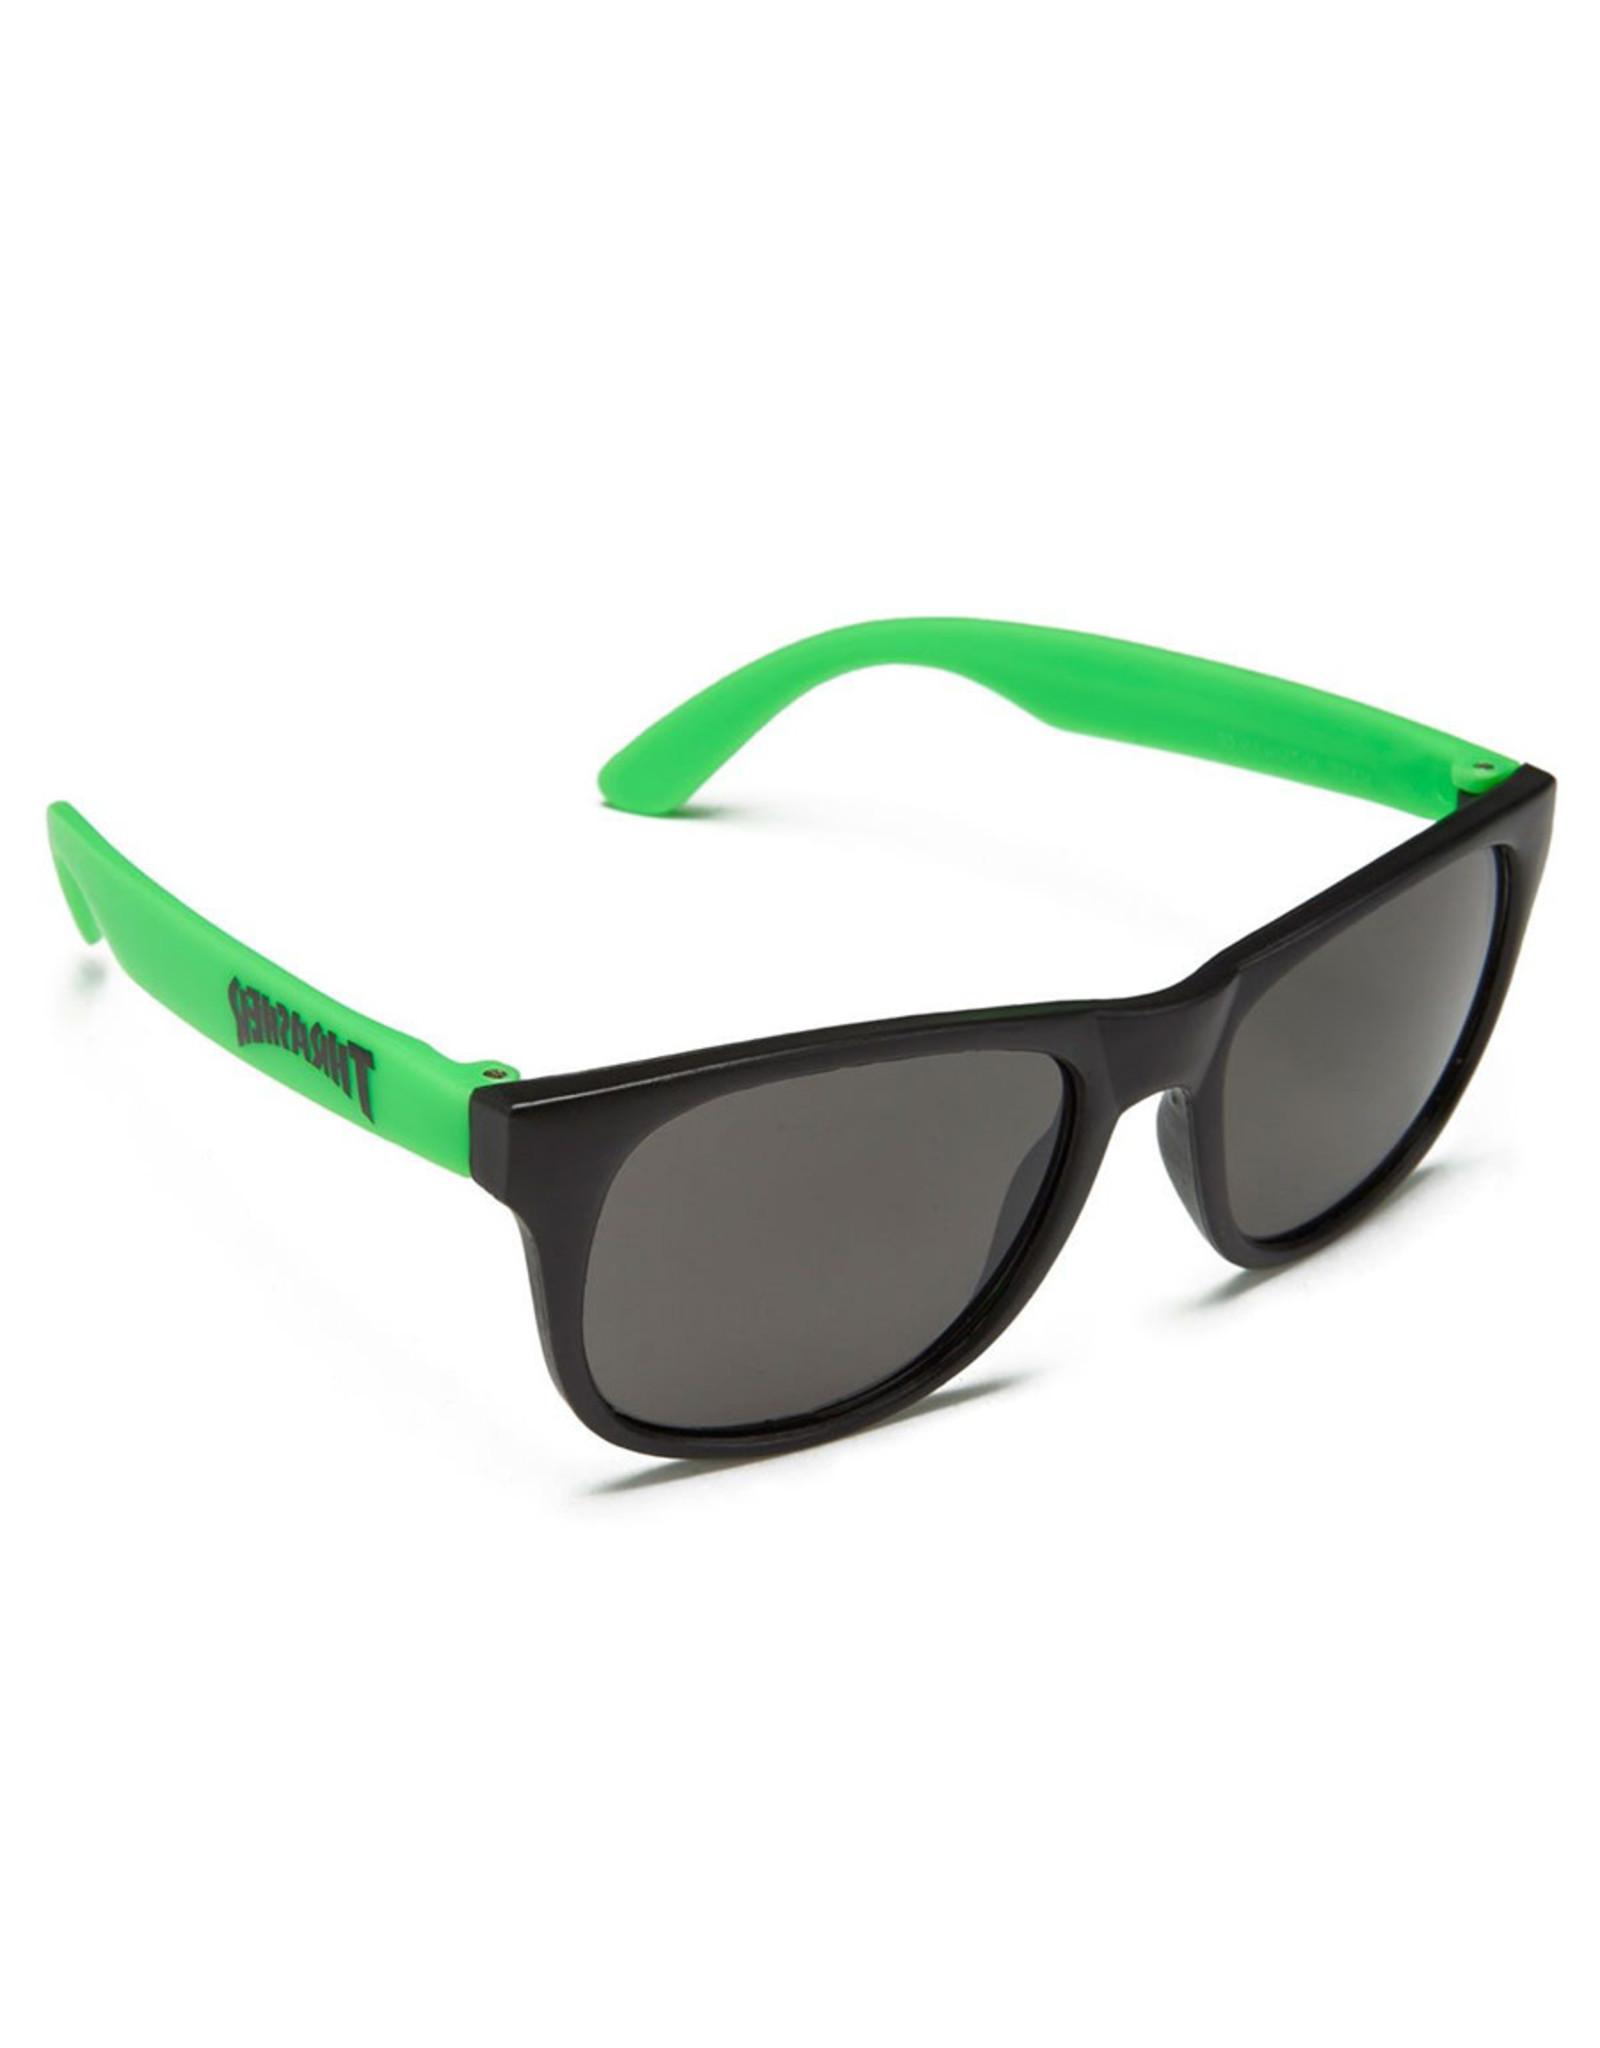 Thrasher Thrasher Sunglasses Sk8 Mag (Black/Green)